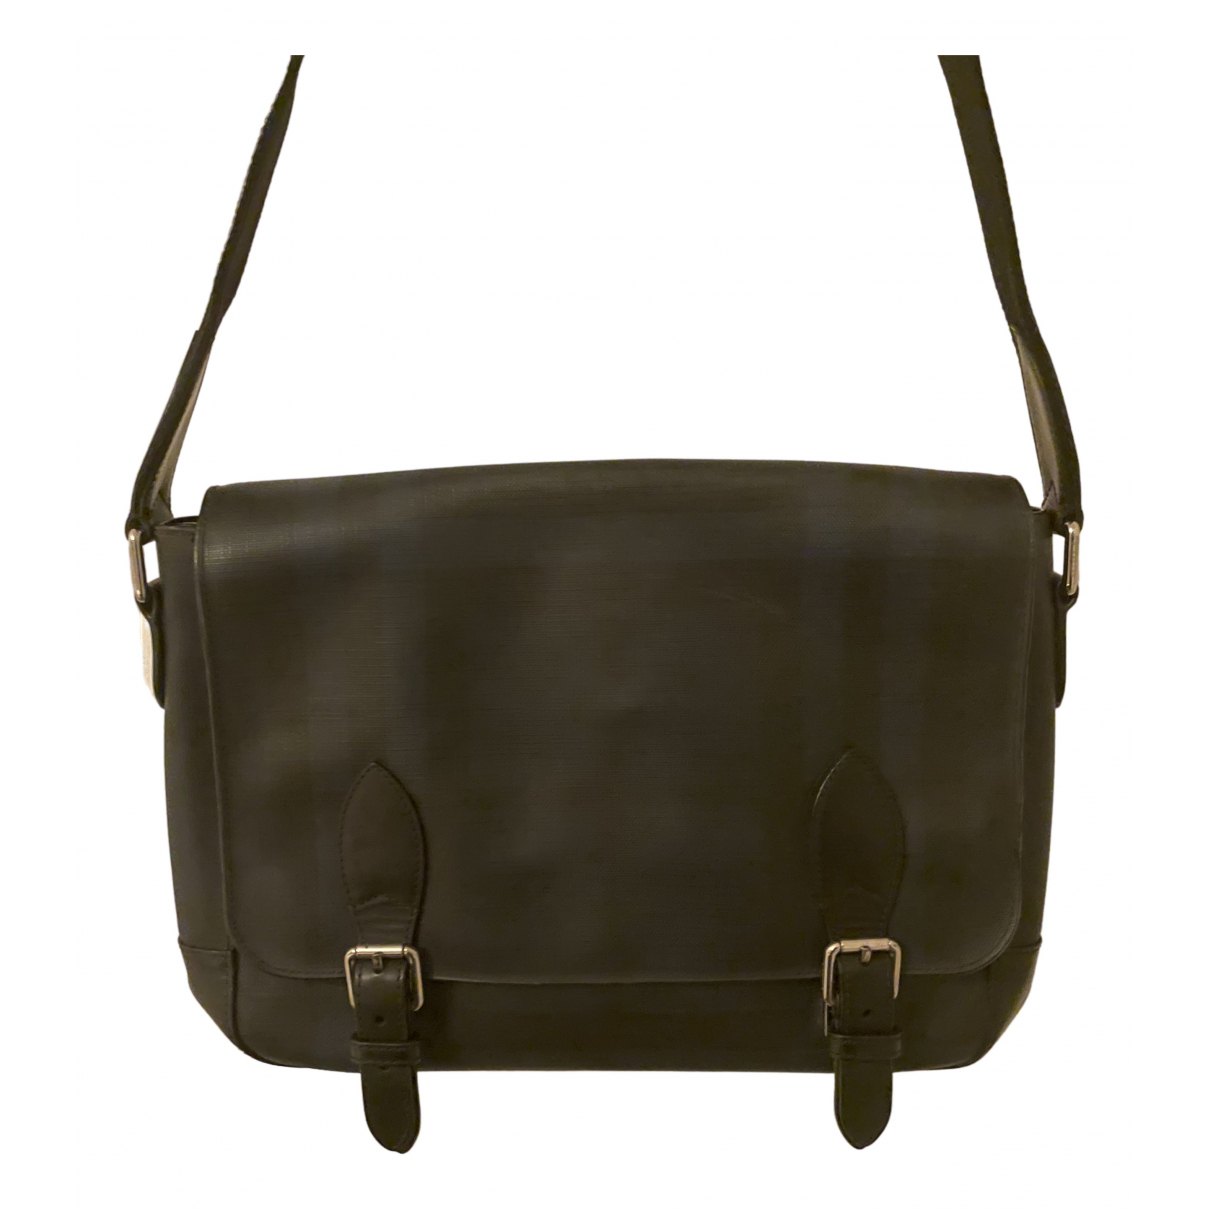 Burberry N Blue Leather bag for Men N